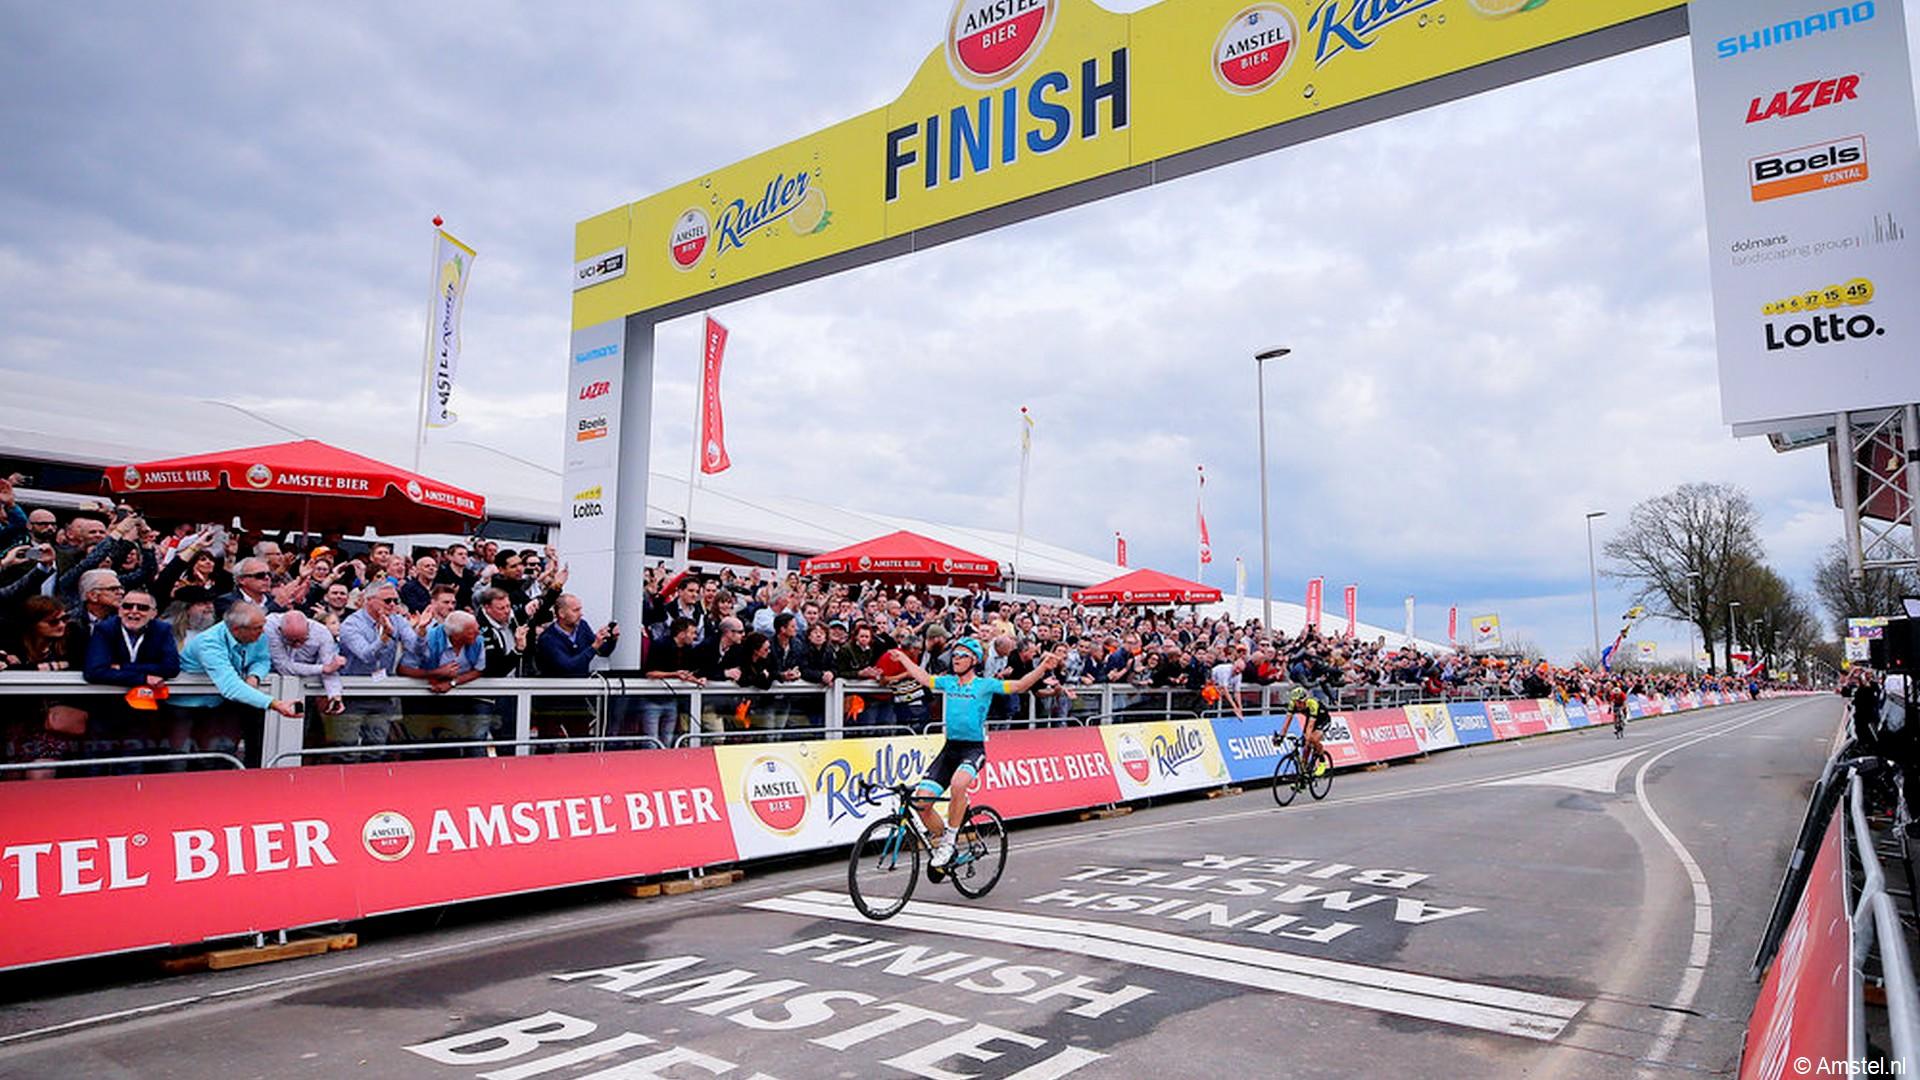 Amstel Gold Race (3) 2018